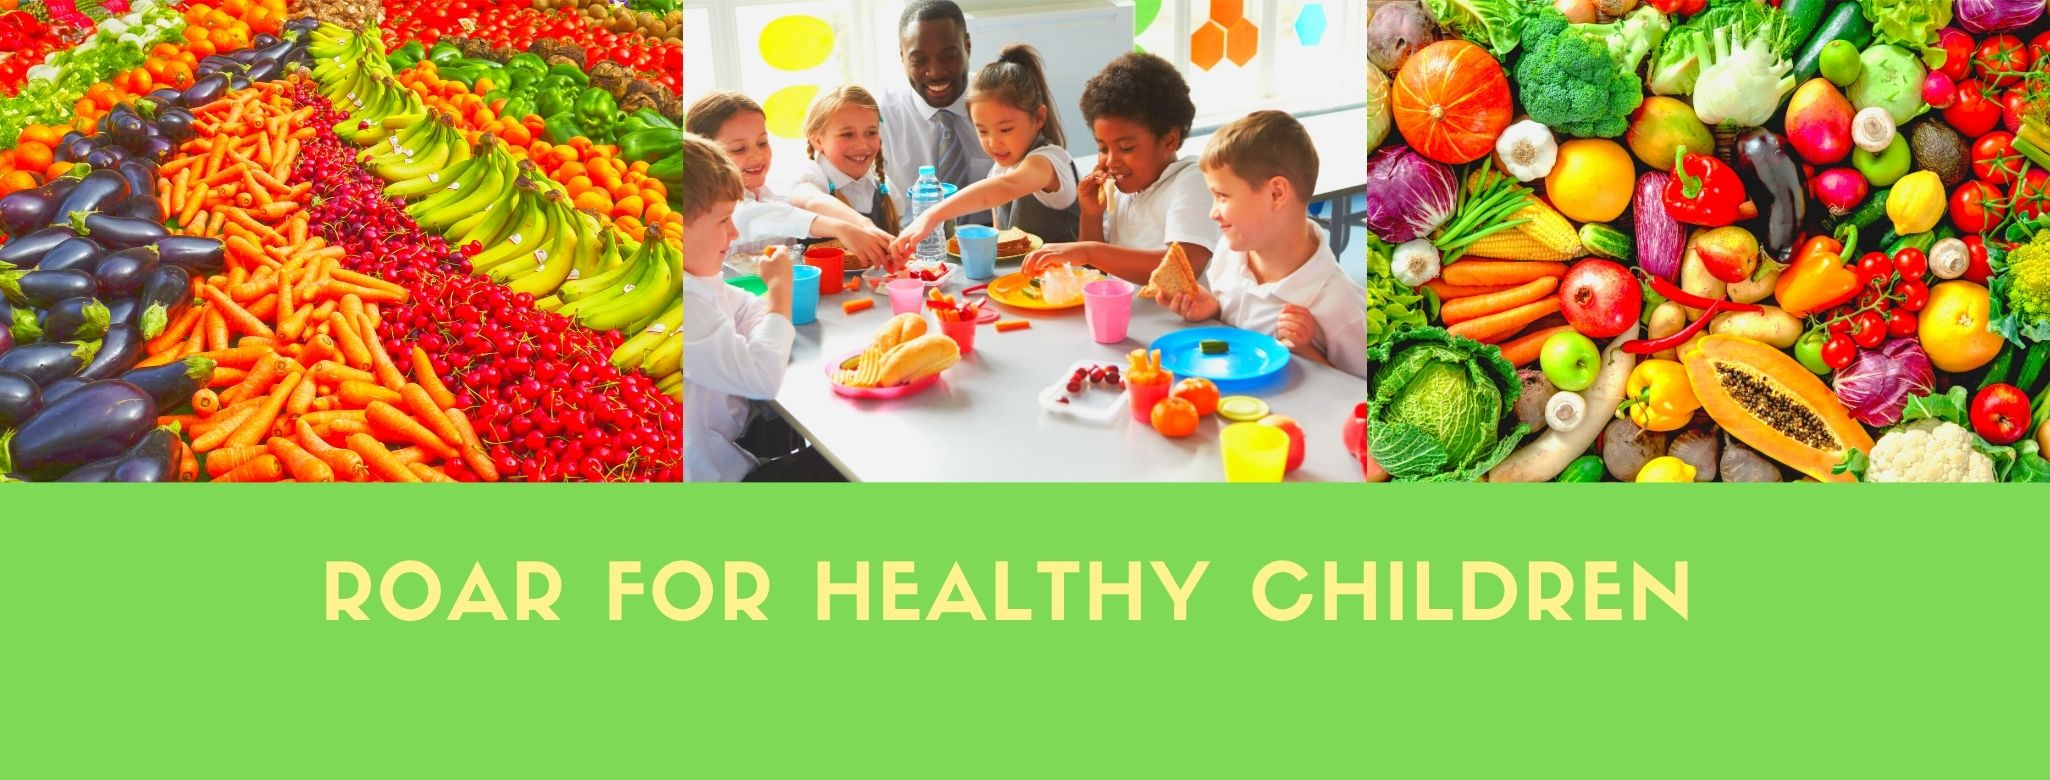 roar-for-healthy-children